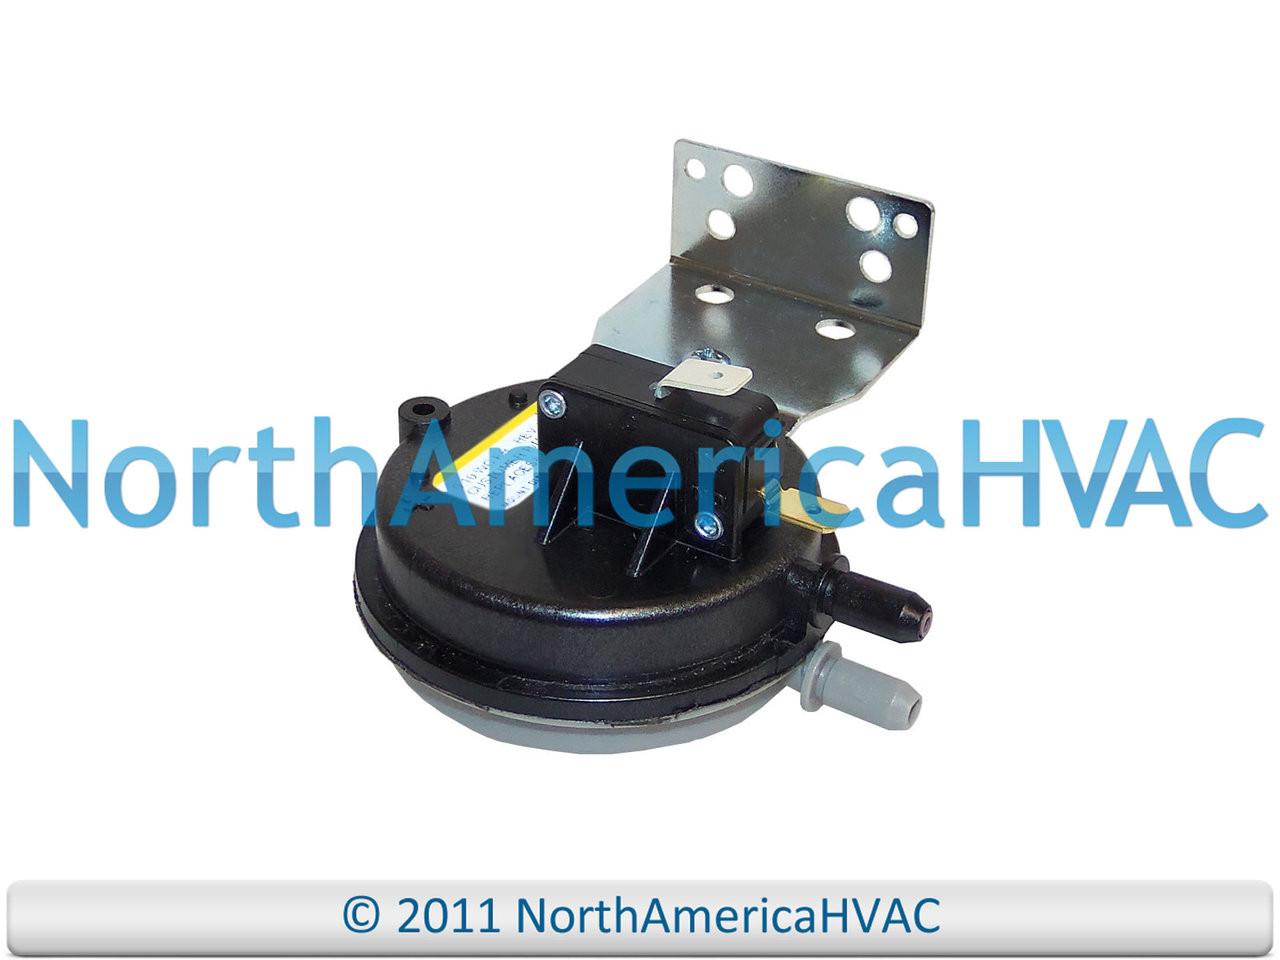 FanWayer Air Pressure Switch 170-200 PSI Pressure Switch 1//4-18 NPT DC 24V 12V Pressure Switch Air Compressor Pressure Switch 200PSI Pressure Switch Air Horn//Tank Pressure Switch